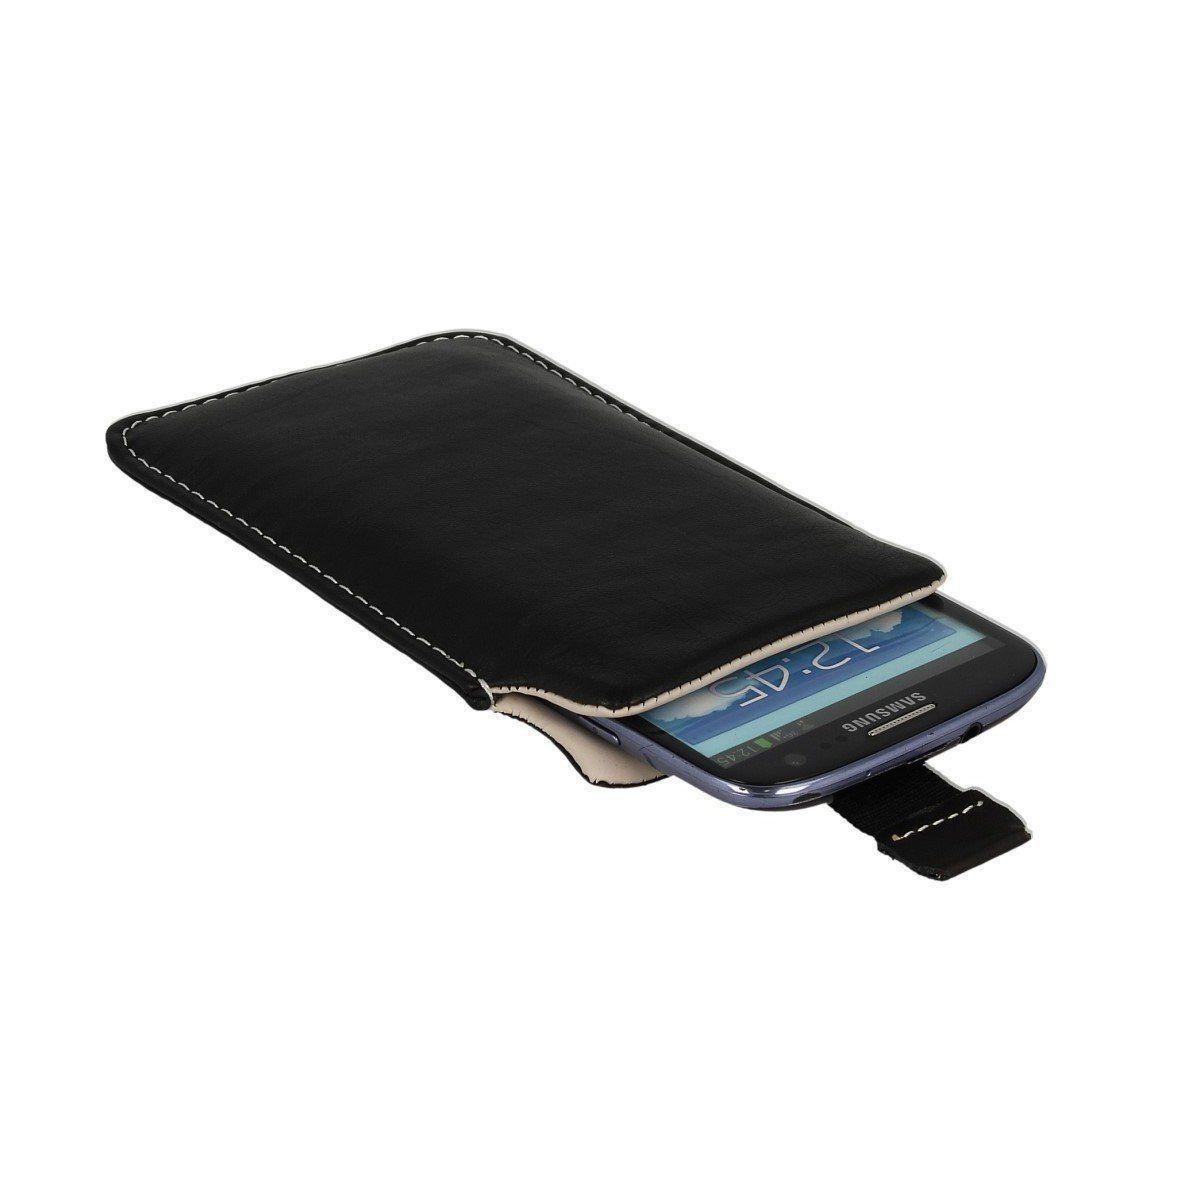 e412fdaa80147 Etui wsuwka skórzana De Lux na telefon Huawei P20 Lite. Model  - Produkt  Polski - Skóra naturalna - Starannie obszyty - Funkcja Pull Up